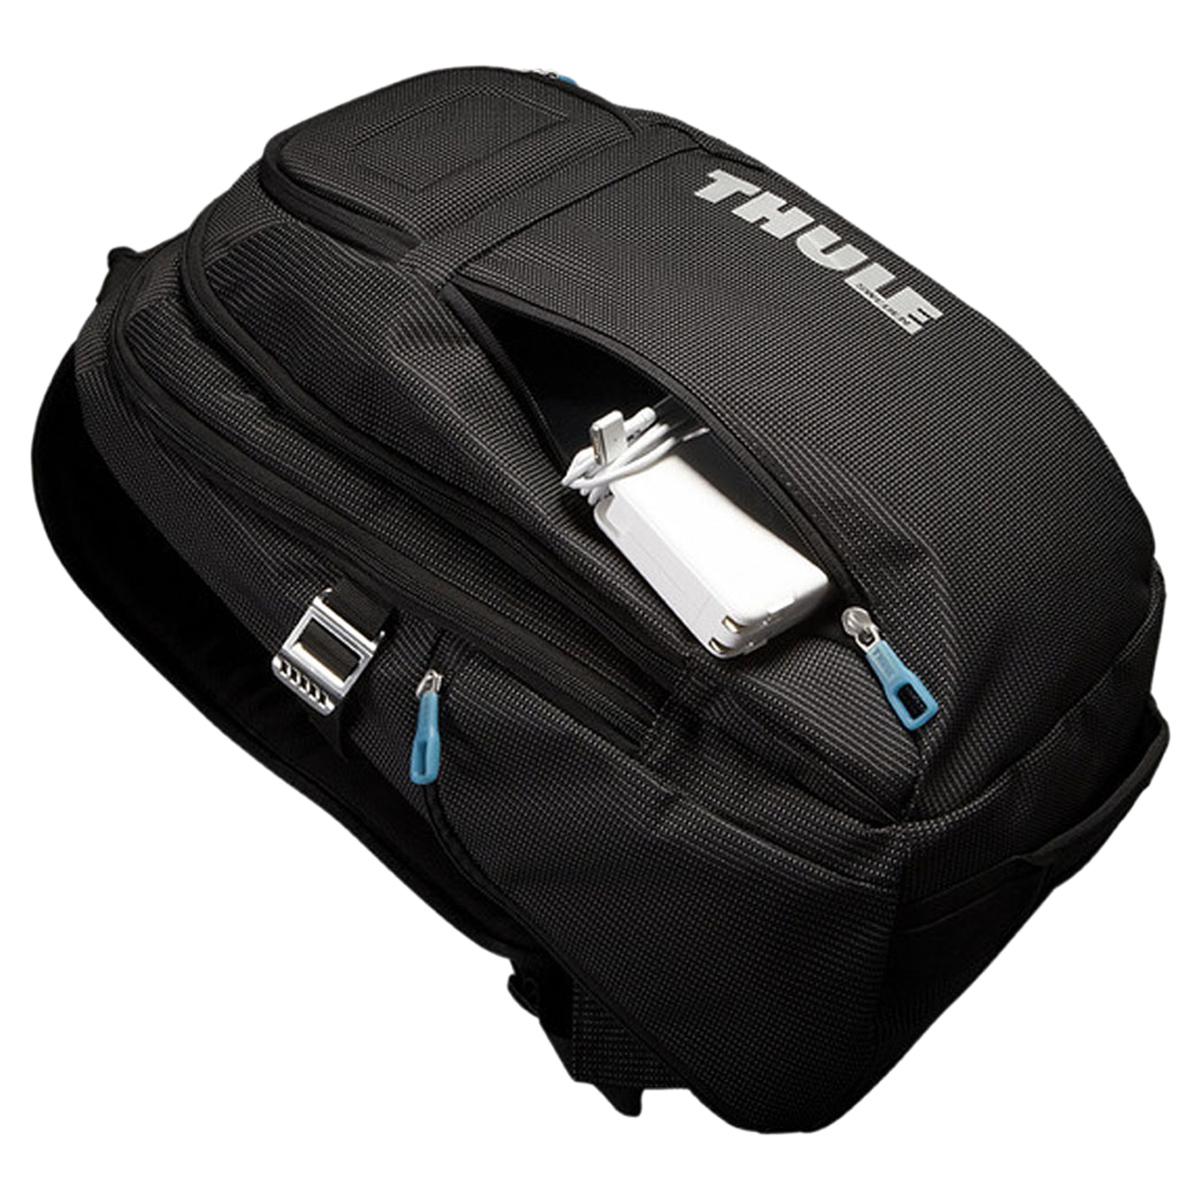 THULE CROSSOVER BACKPACK Sioux Lee rucksack bag backpack crossover men gap  Dis 21L black black 3201751 [8/6 Shinnyu load]